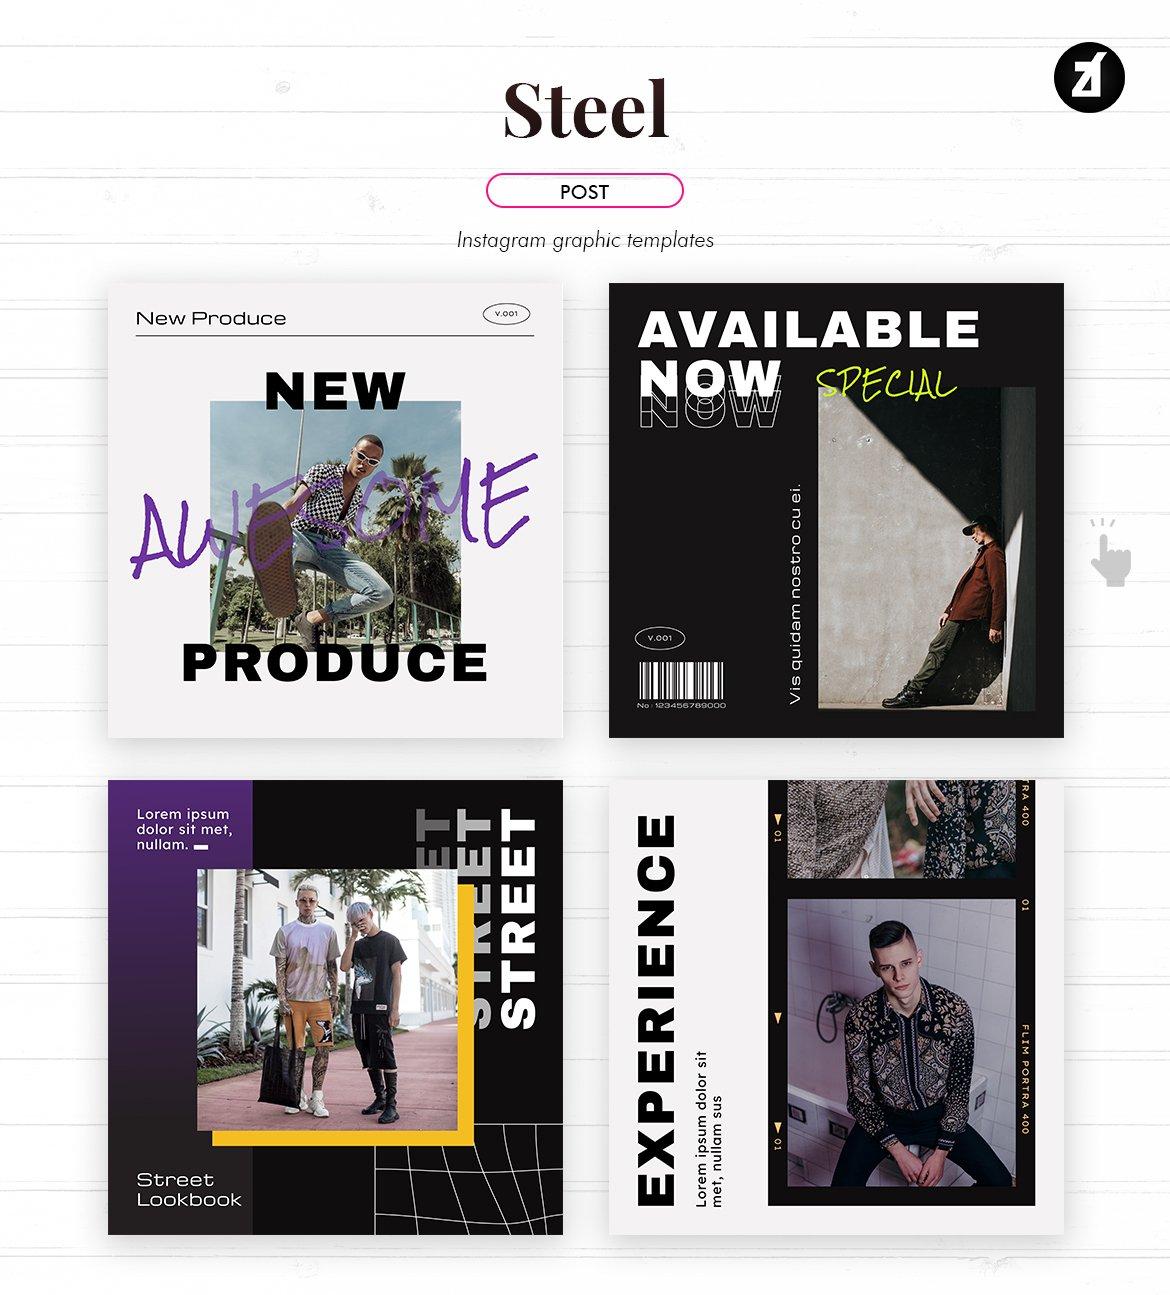 潮流撕纸效果新媒体推广海报设计模板 Steel Social Media Graphic Templates插图(1)